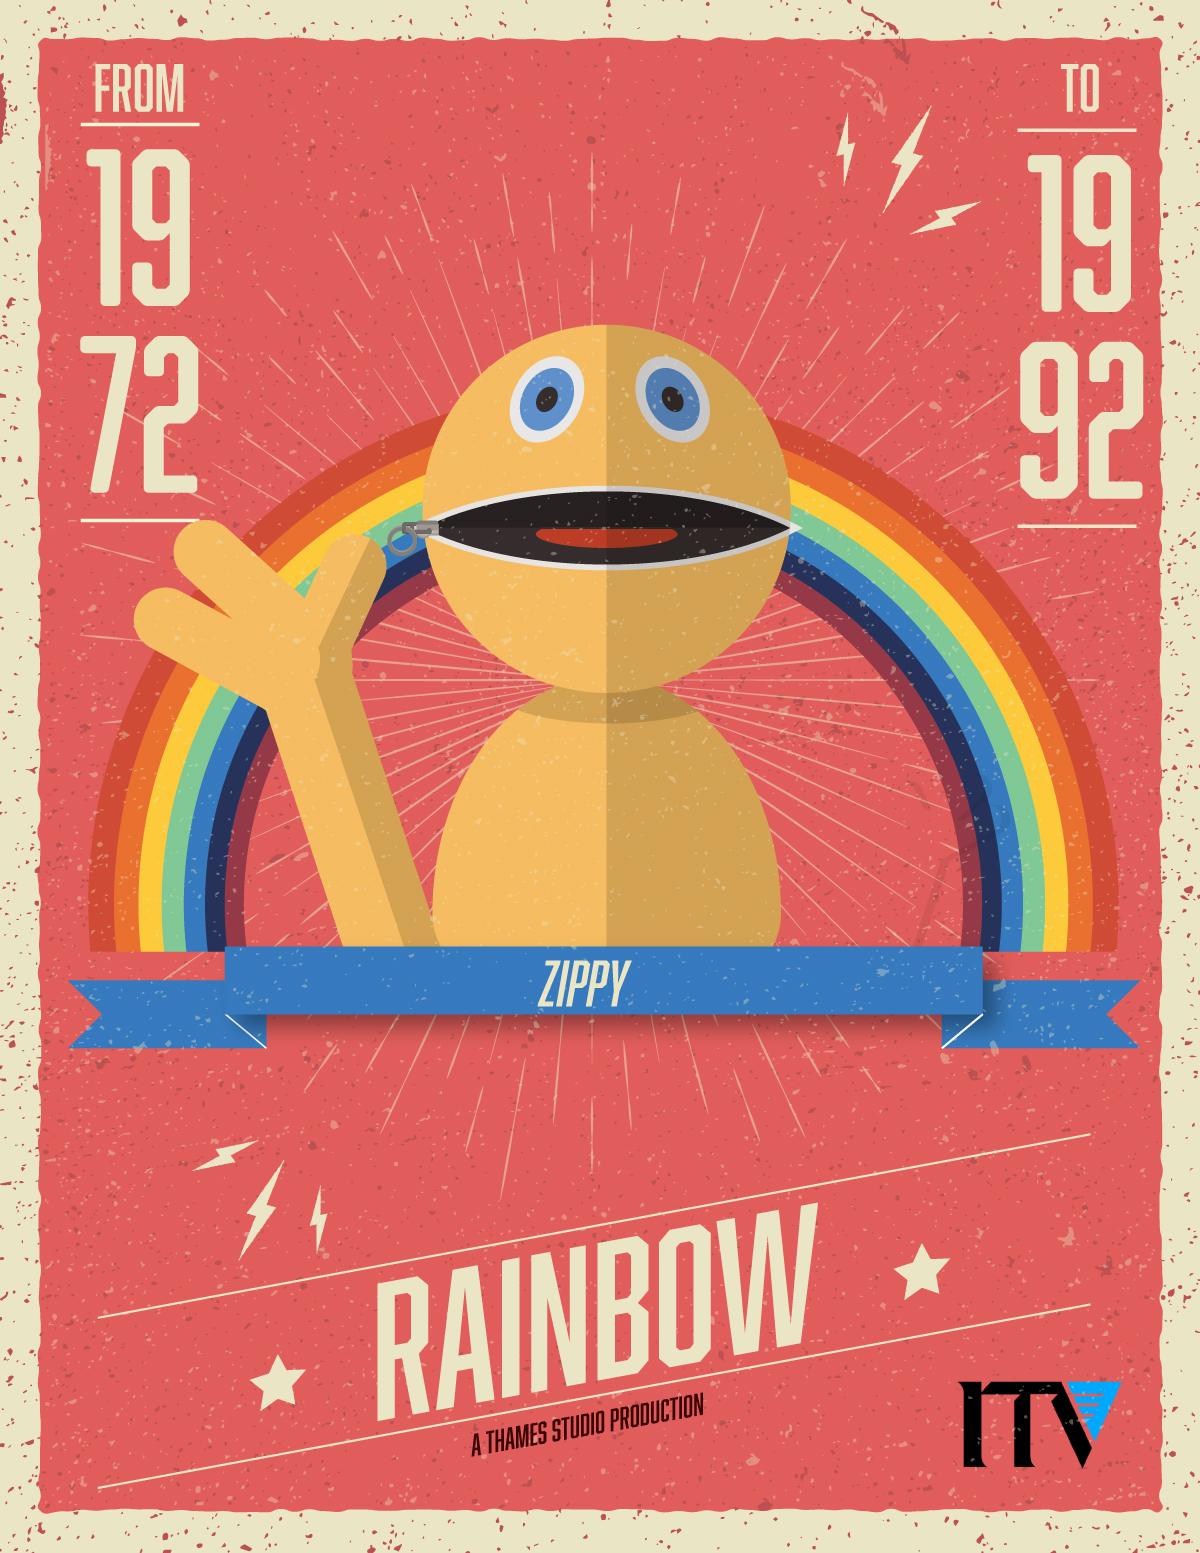 rainbow-zippy